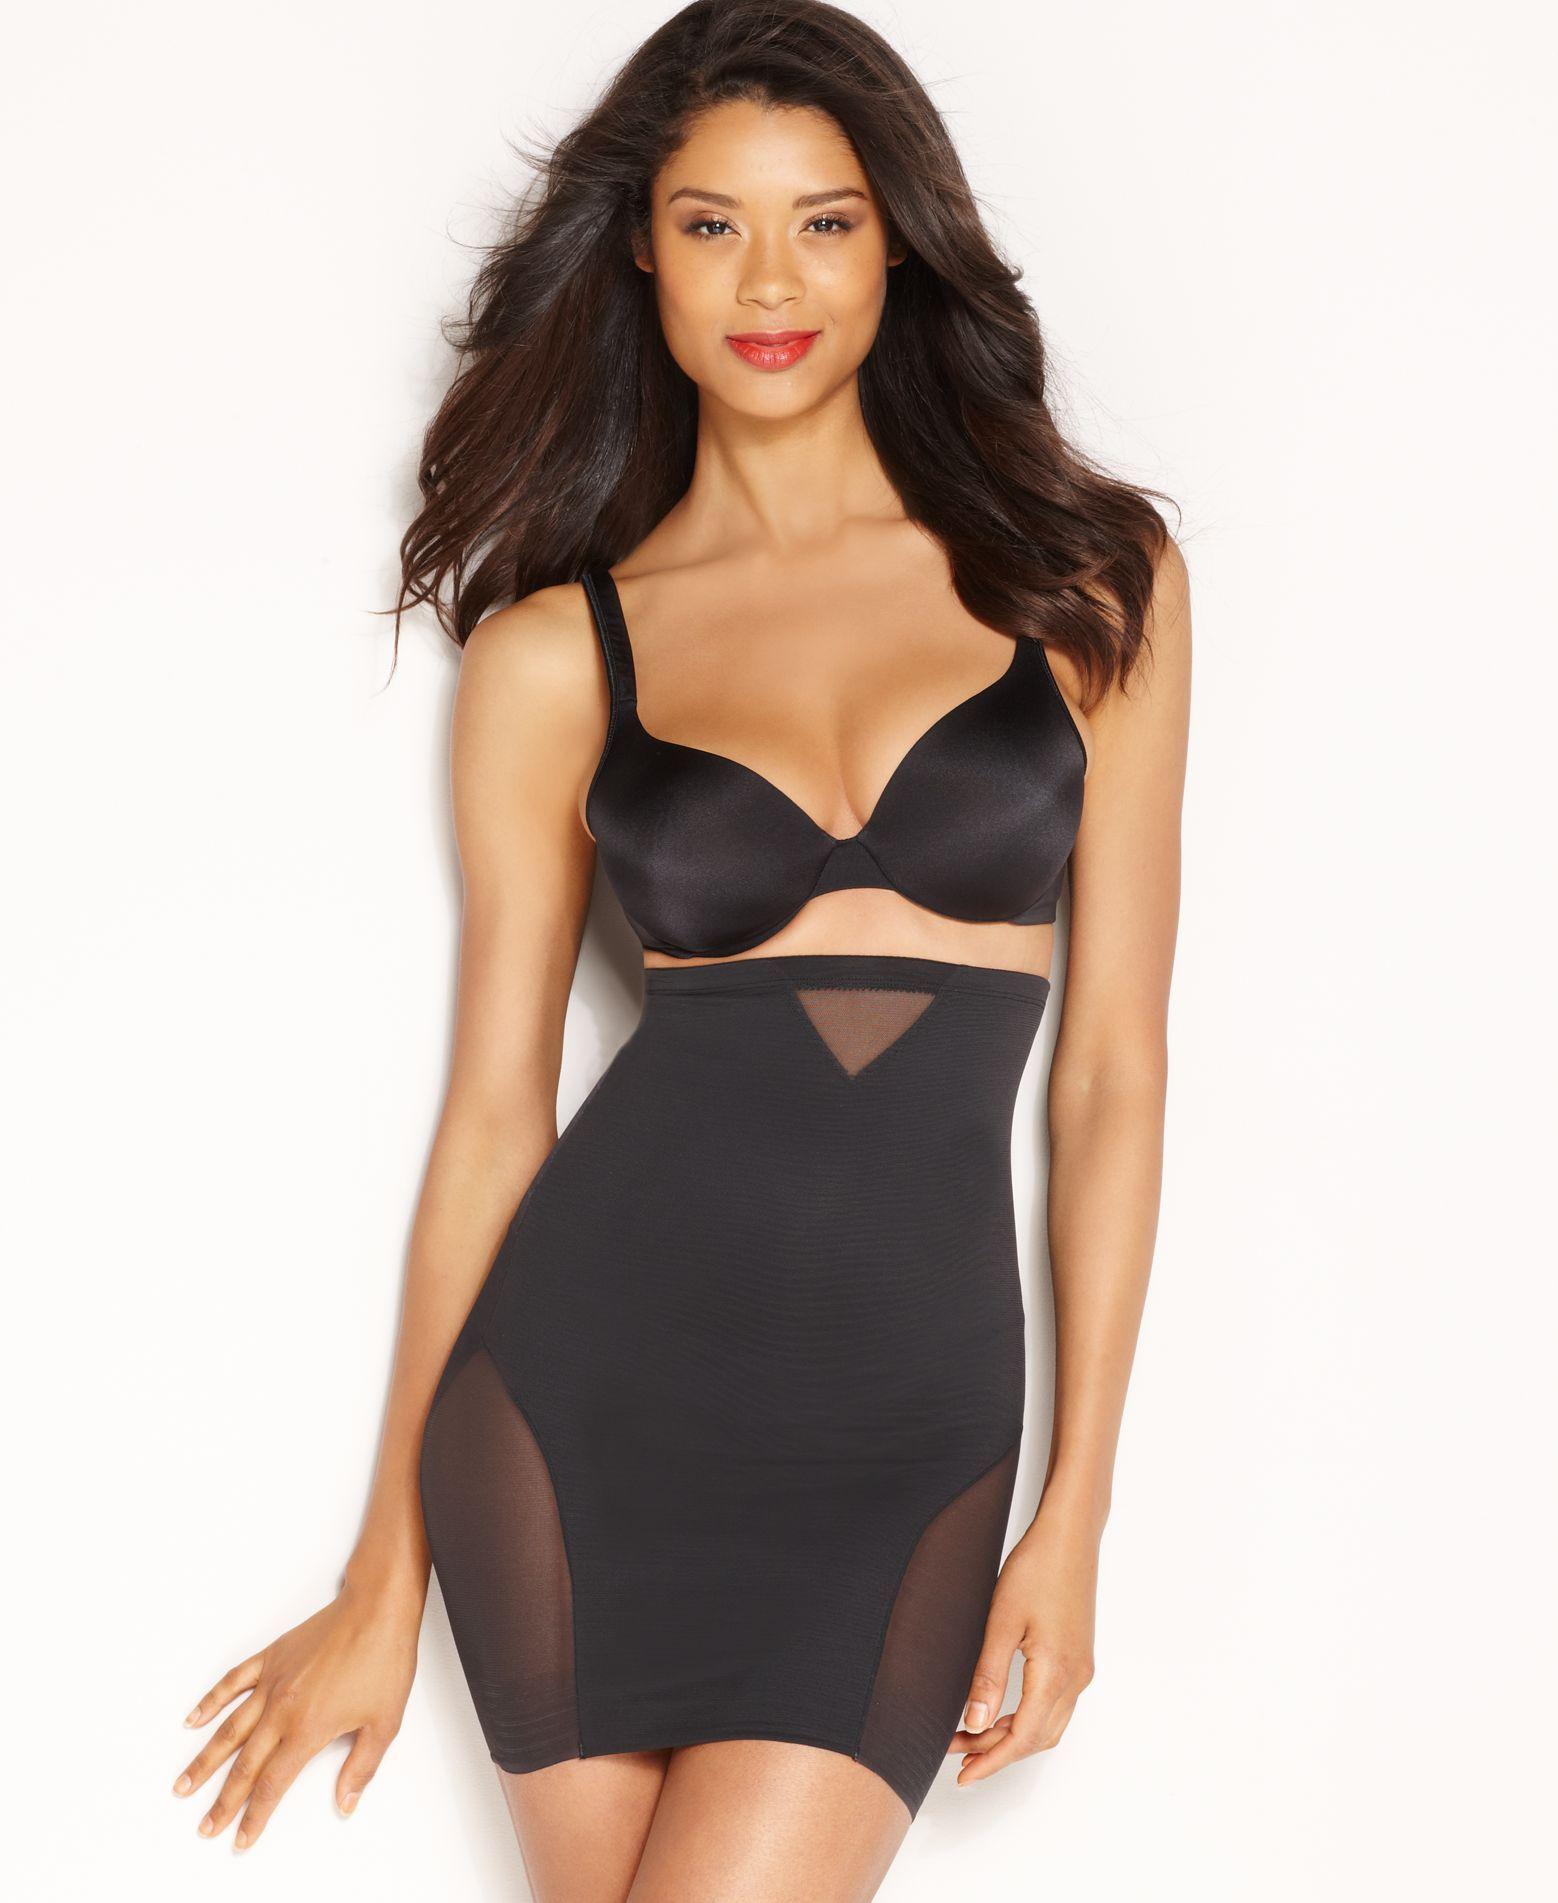 64ab5352bf227 Women s Extra Firm Tummy-Control High Waist Sheer Half Slip 2784 in ...